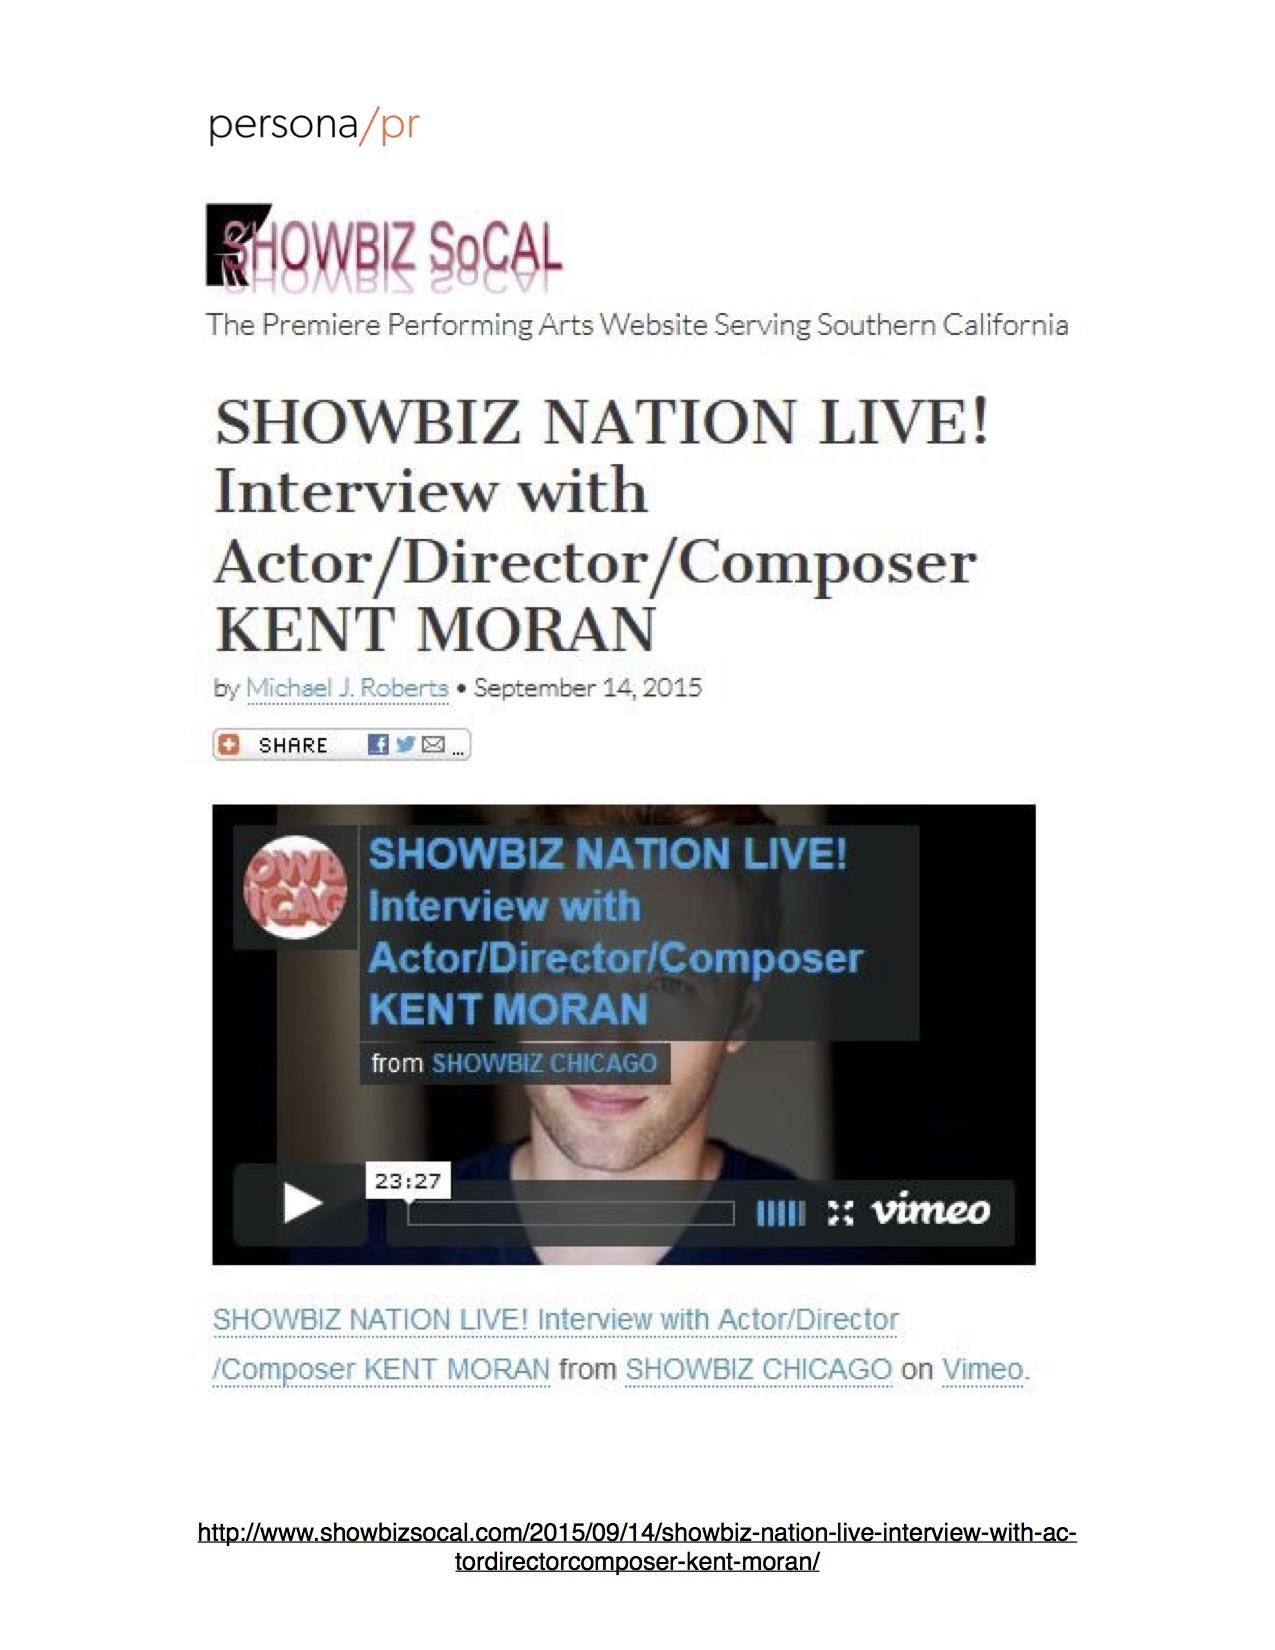 31 KentMoran-ShowbizSoCal.com-9.14.15.jpg